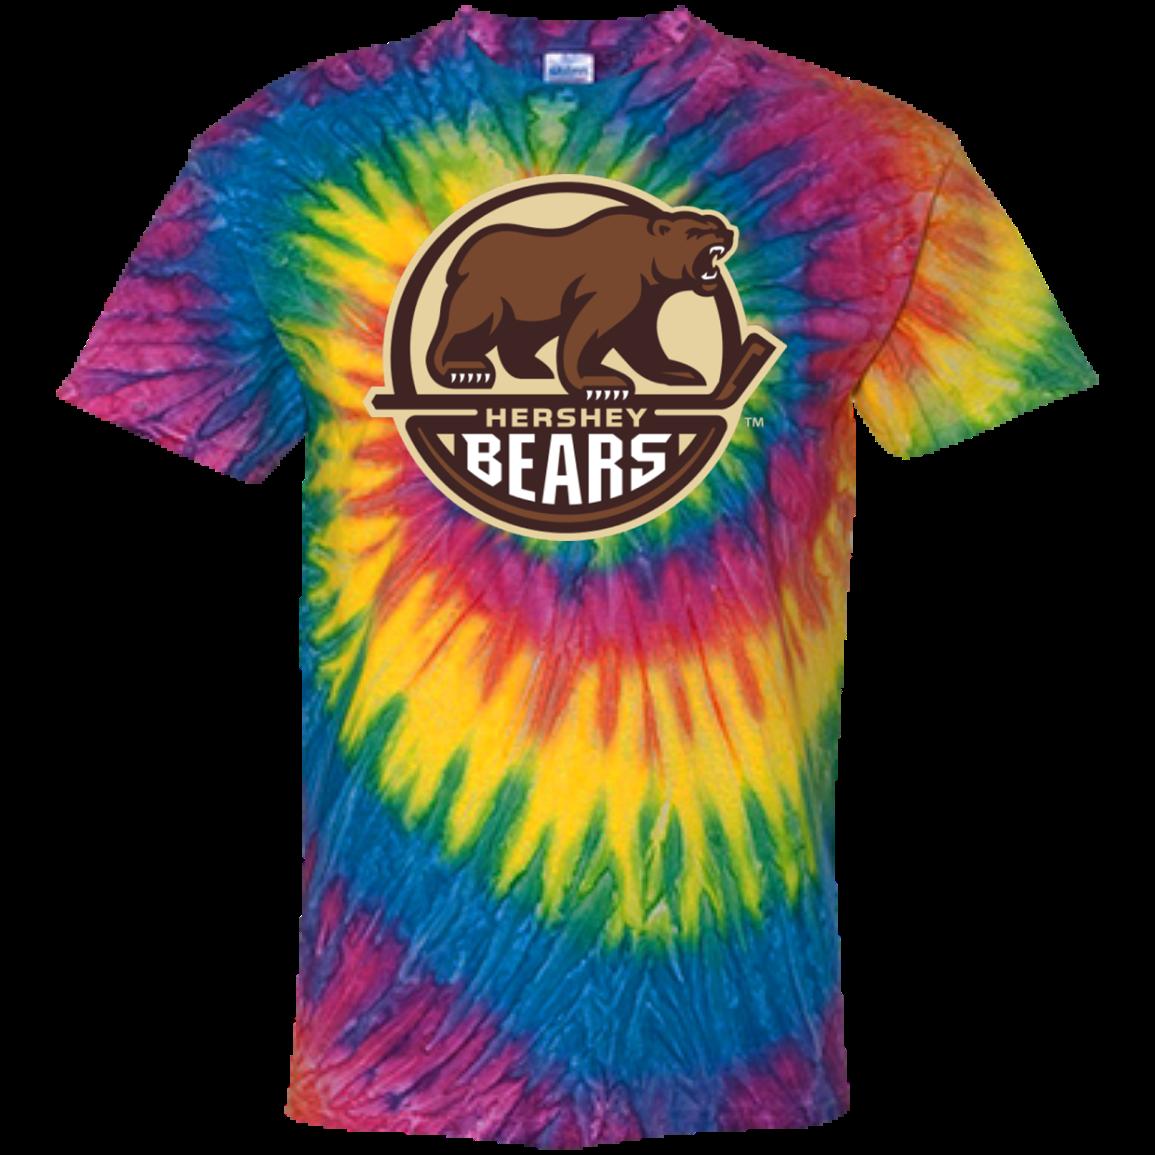 Hershey bears primary logo. Clipart shirt tie dye shirt